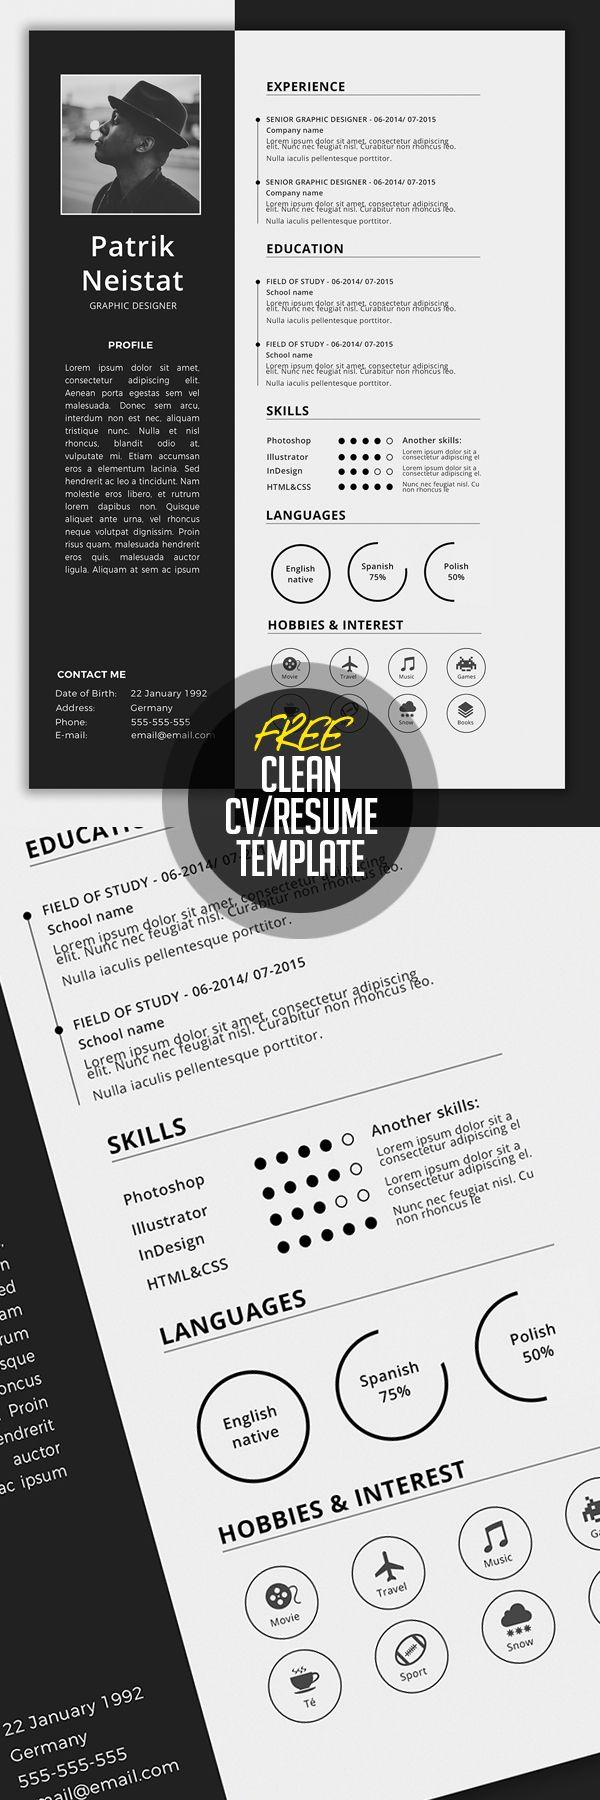 simple cv resume template pinteres simple cv resume template more